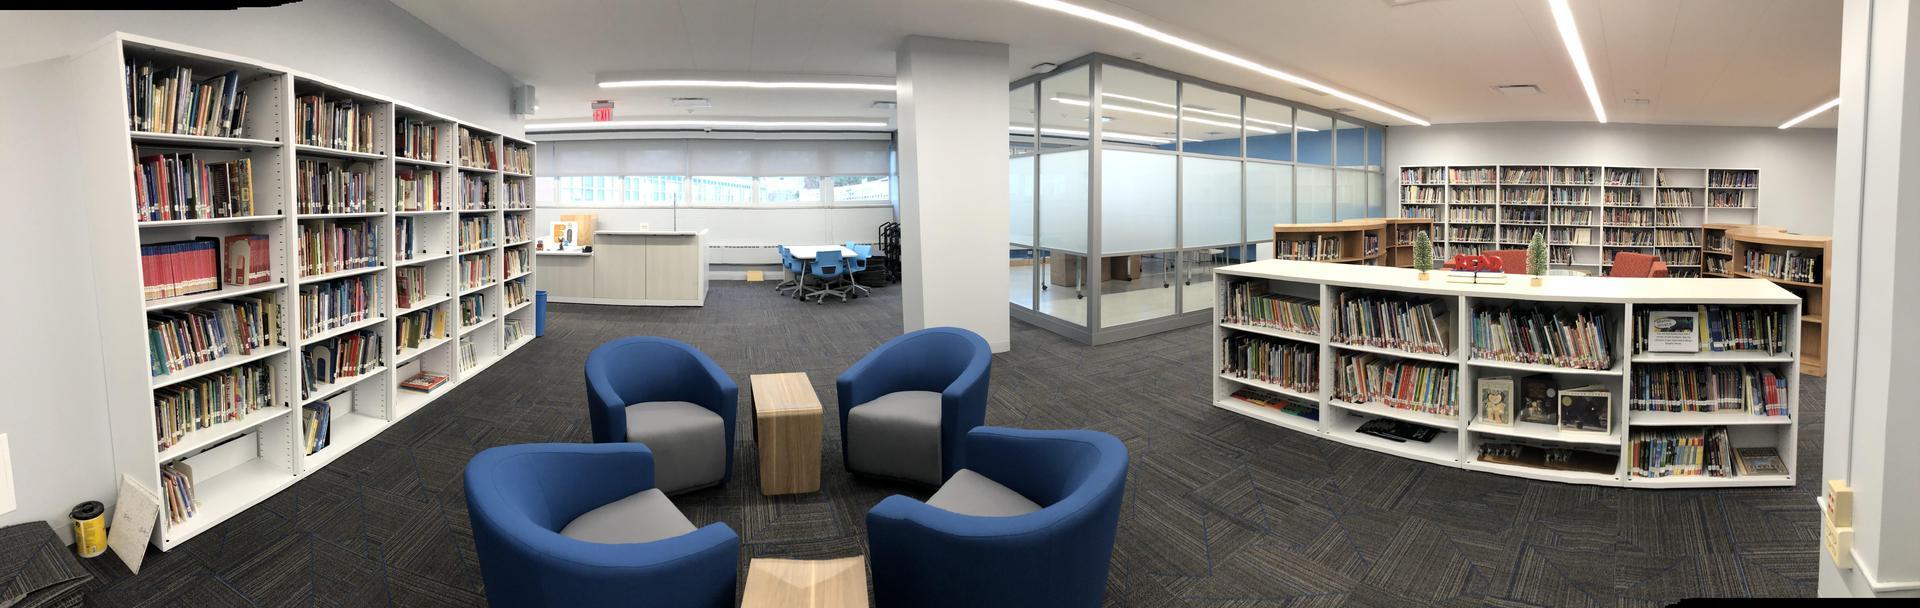 Library panorama